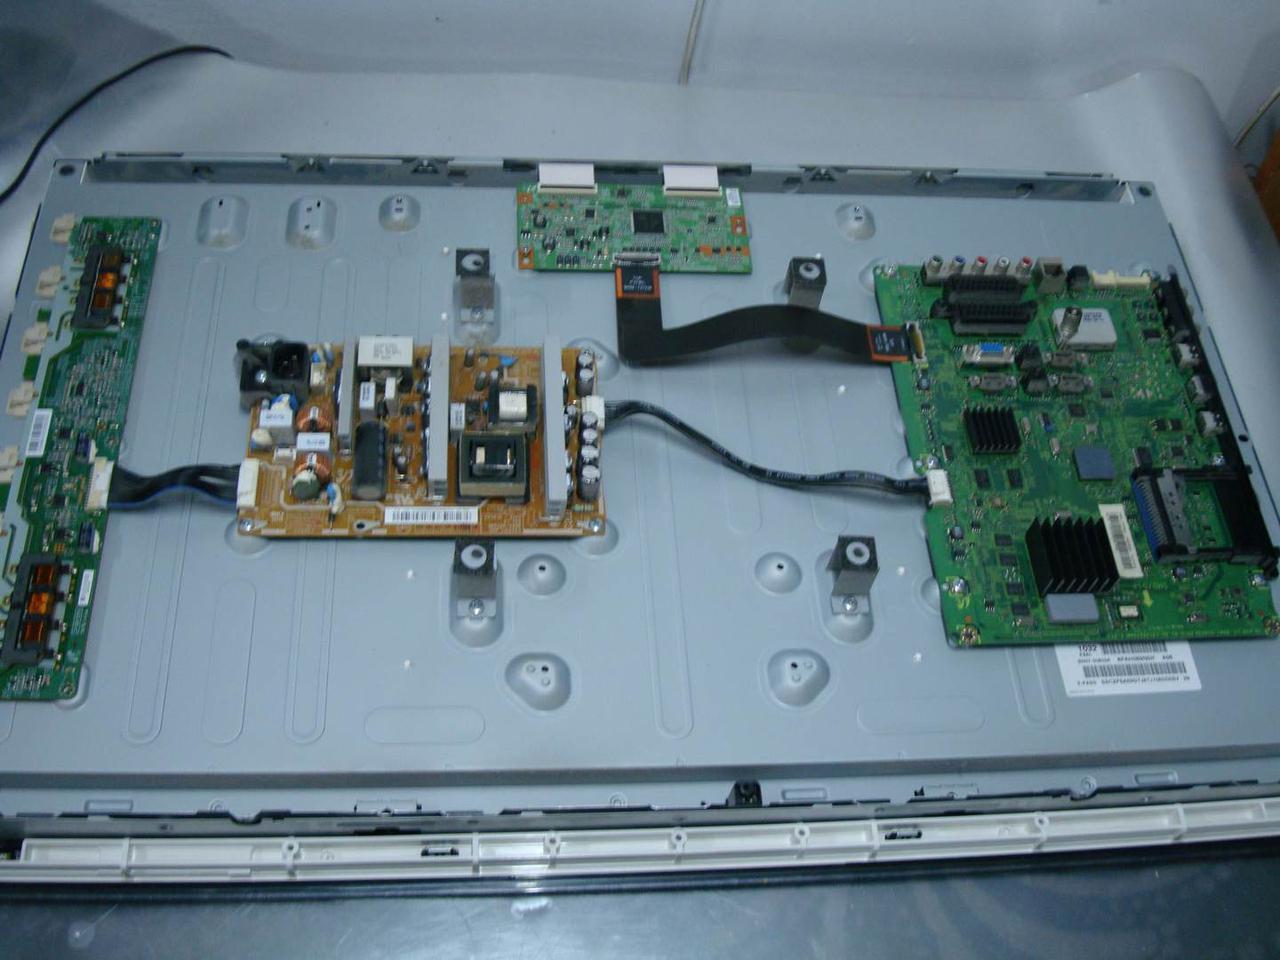 Запчастини до телевізора Samsung LE32C630K1W (BN44-00339D, S120APM4C4LV0.4, SSI320_4UH01 REV 0.3, BN96-12723A)